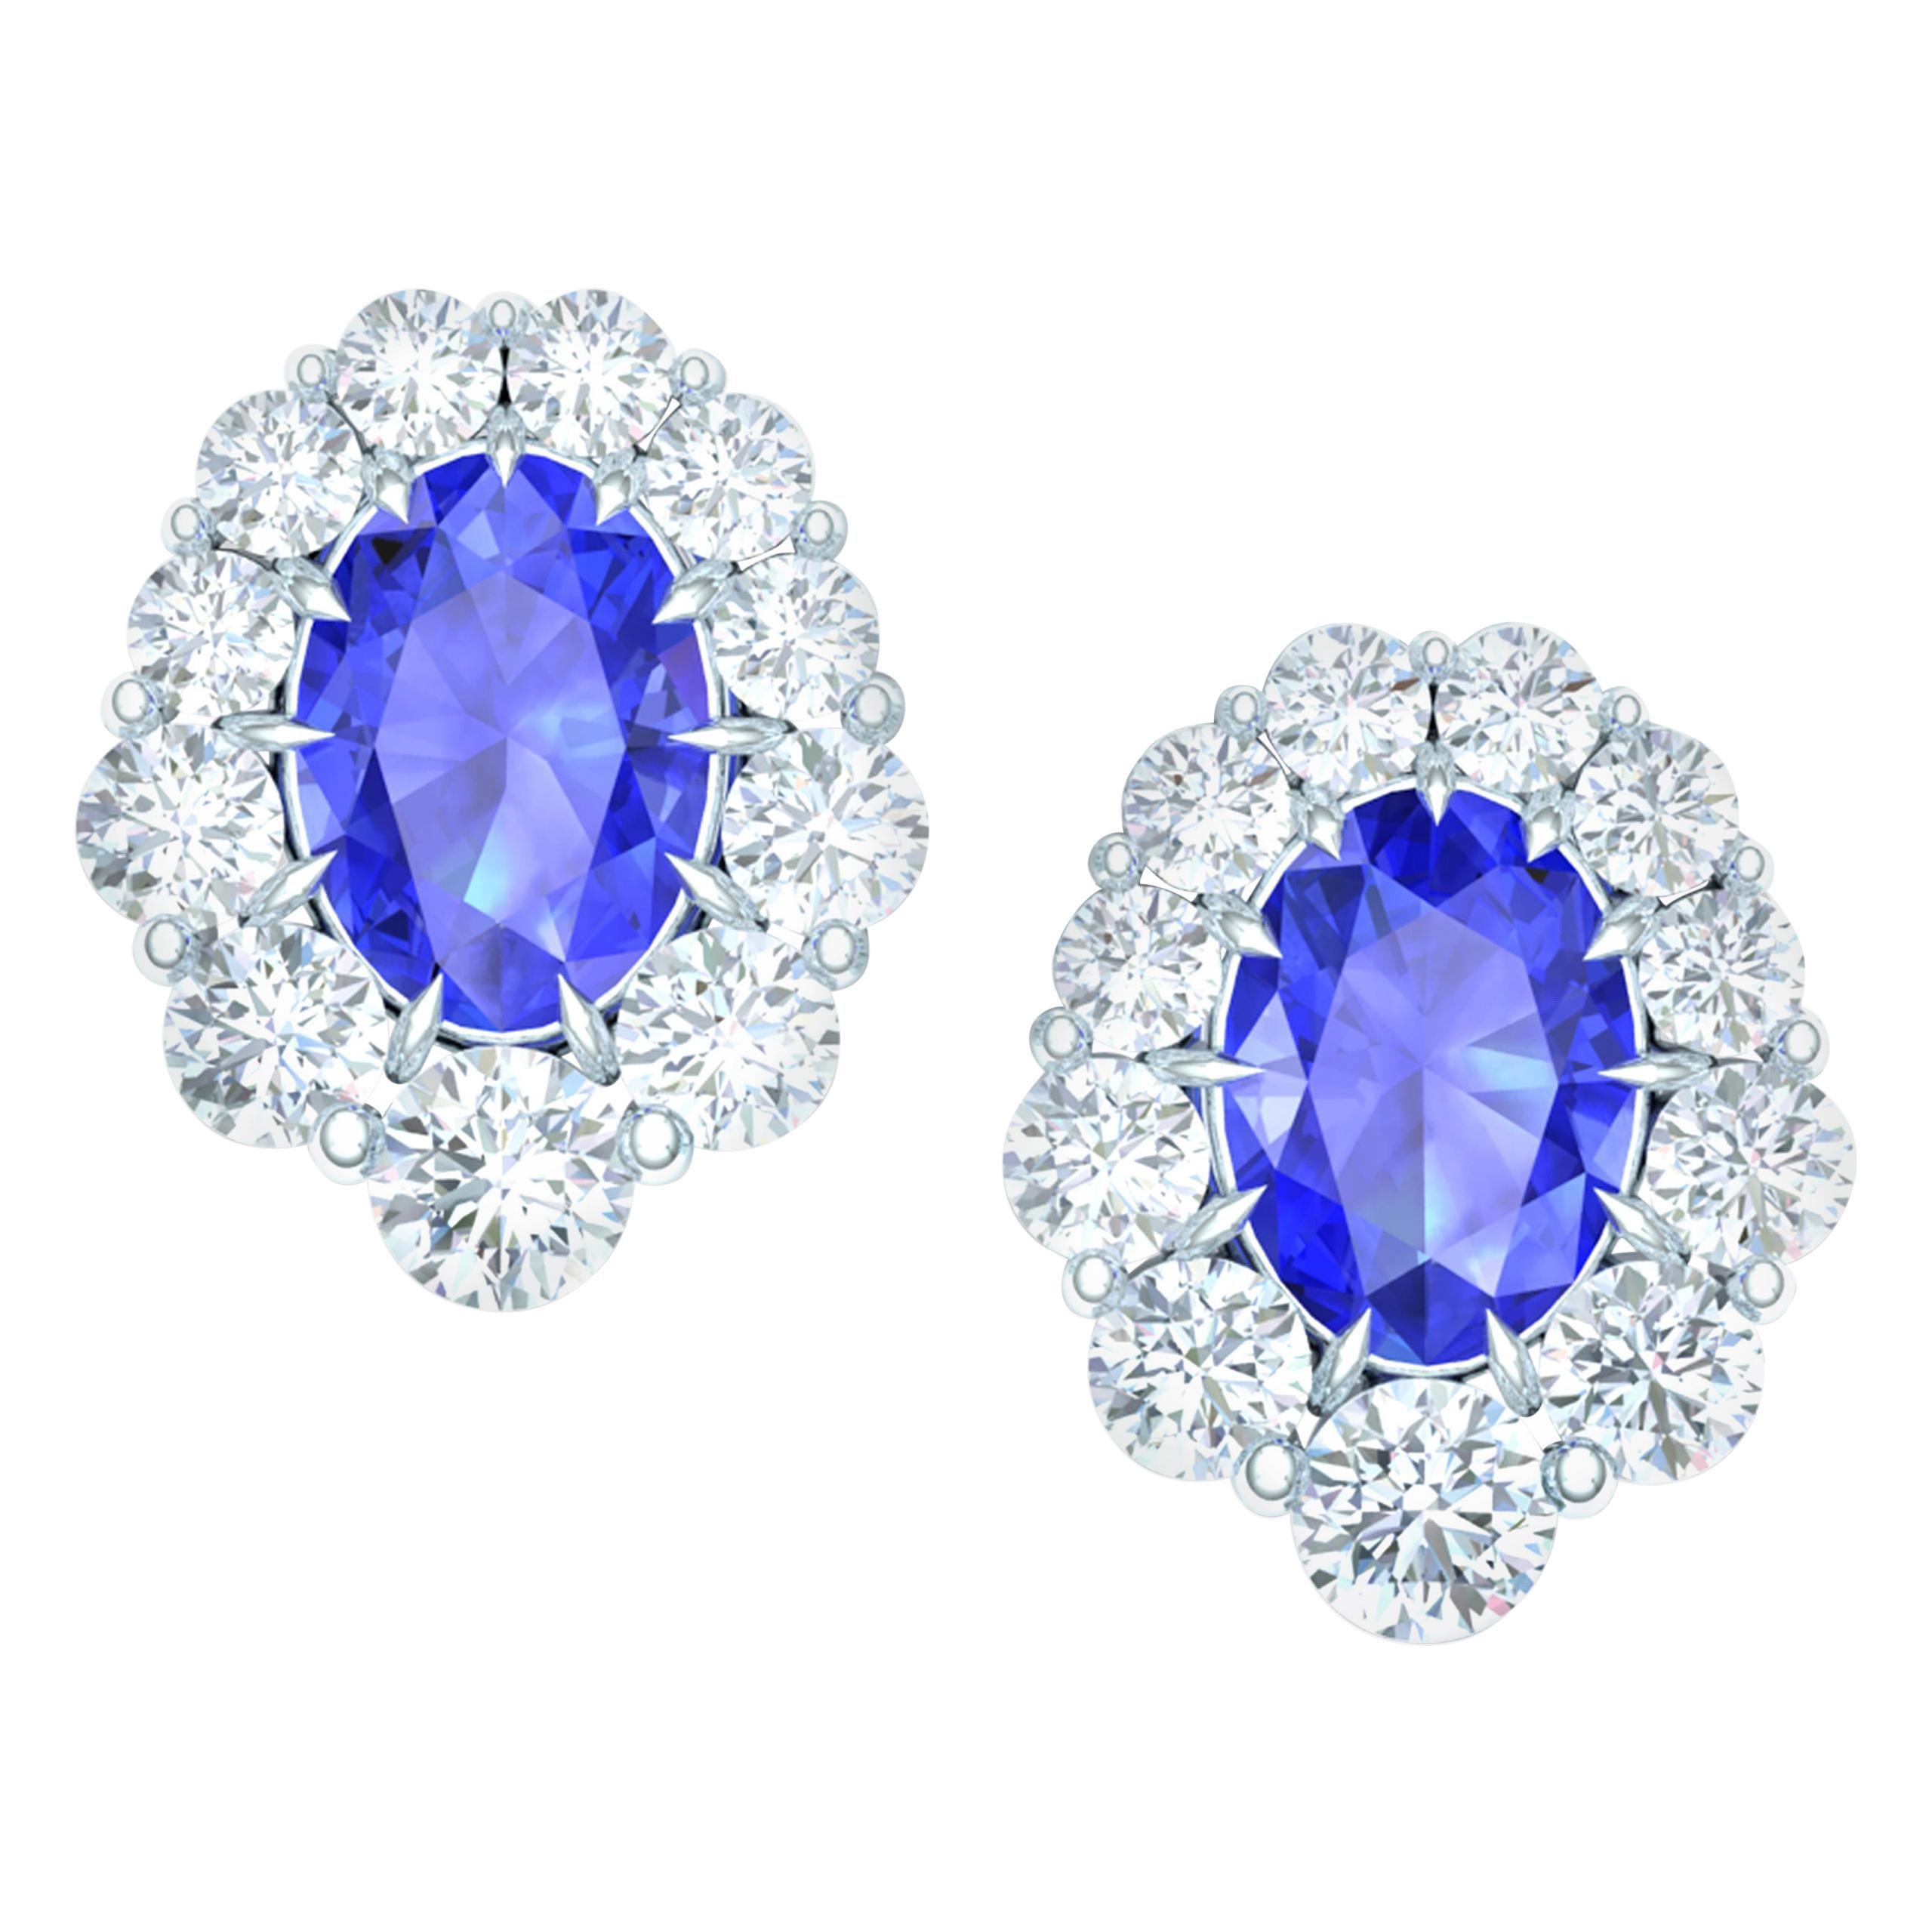 2.50 Carat of Sapphire and Diamond Earrings